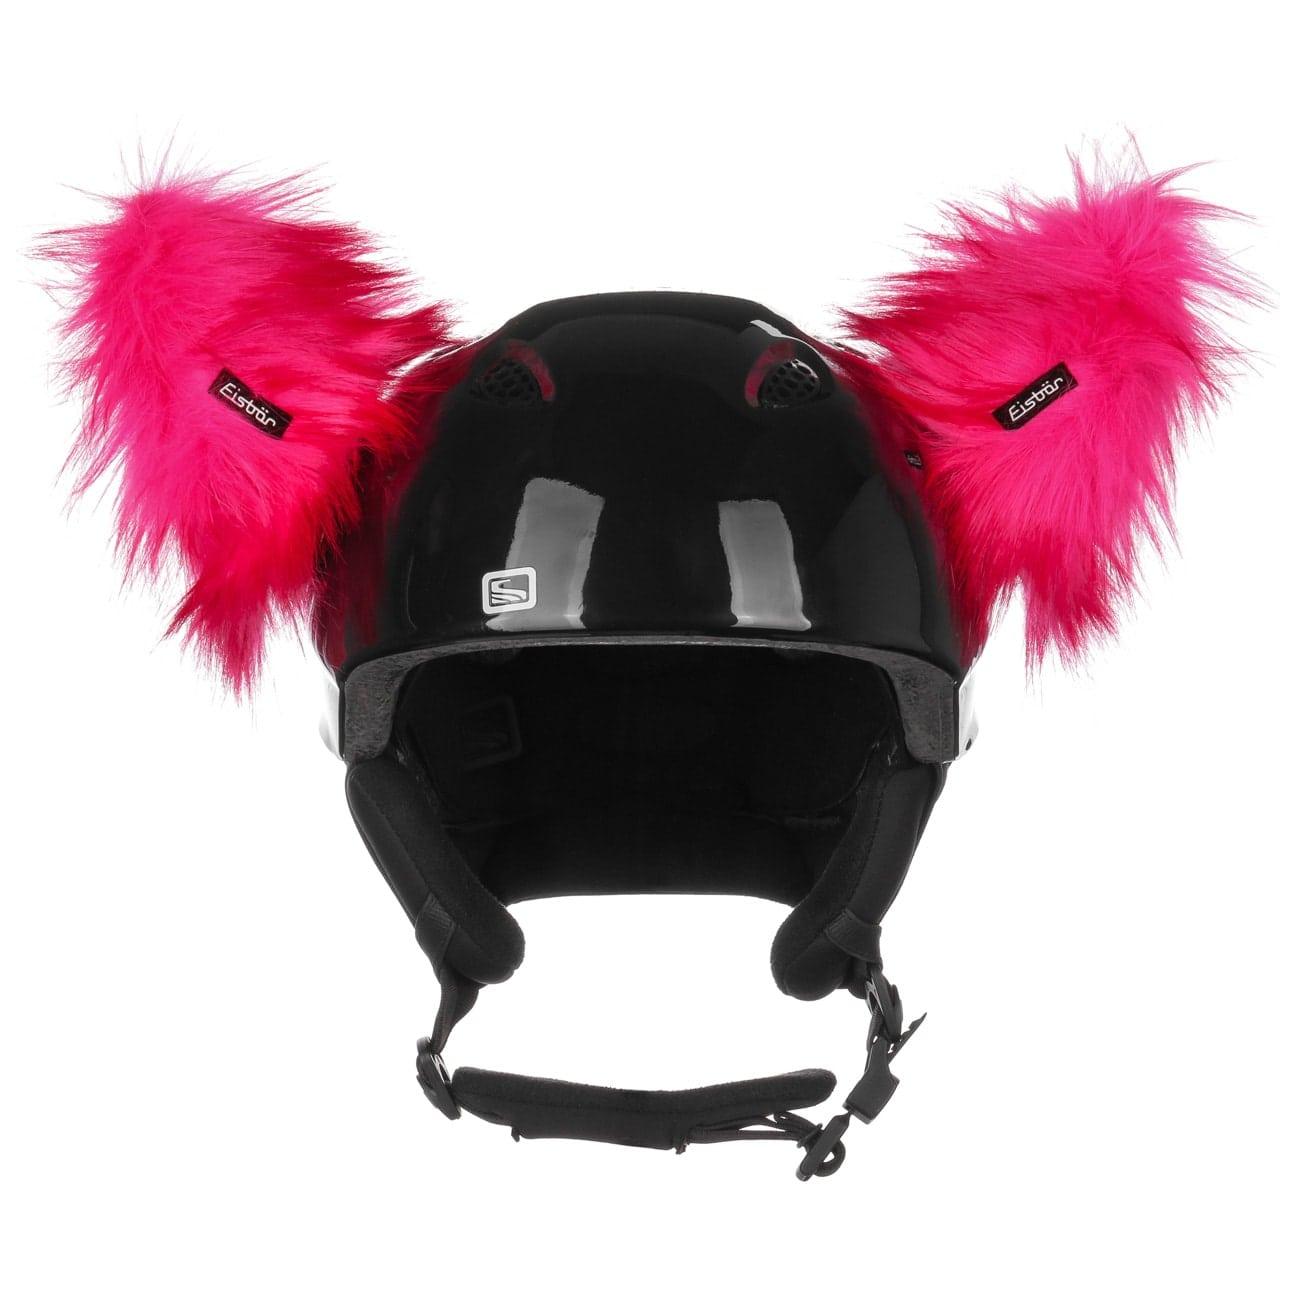 luxury-horns-helmaufkleber-by-eisbar